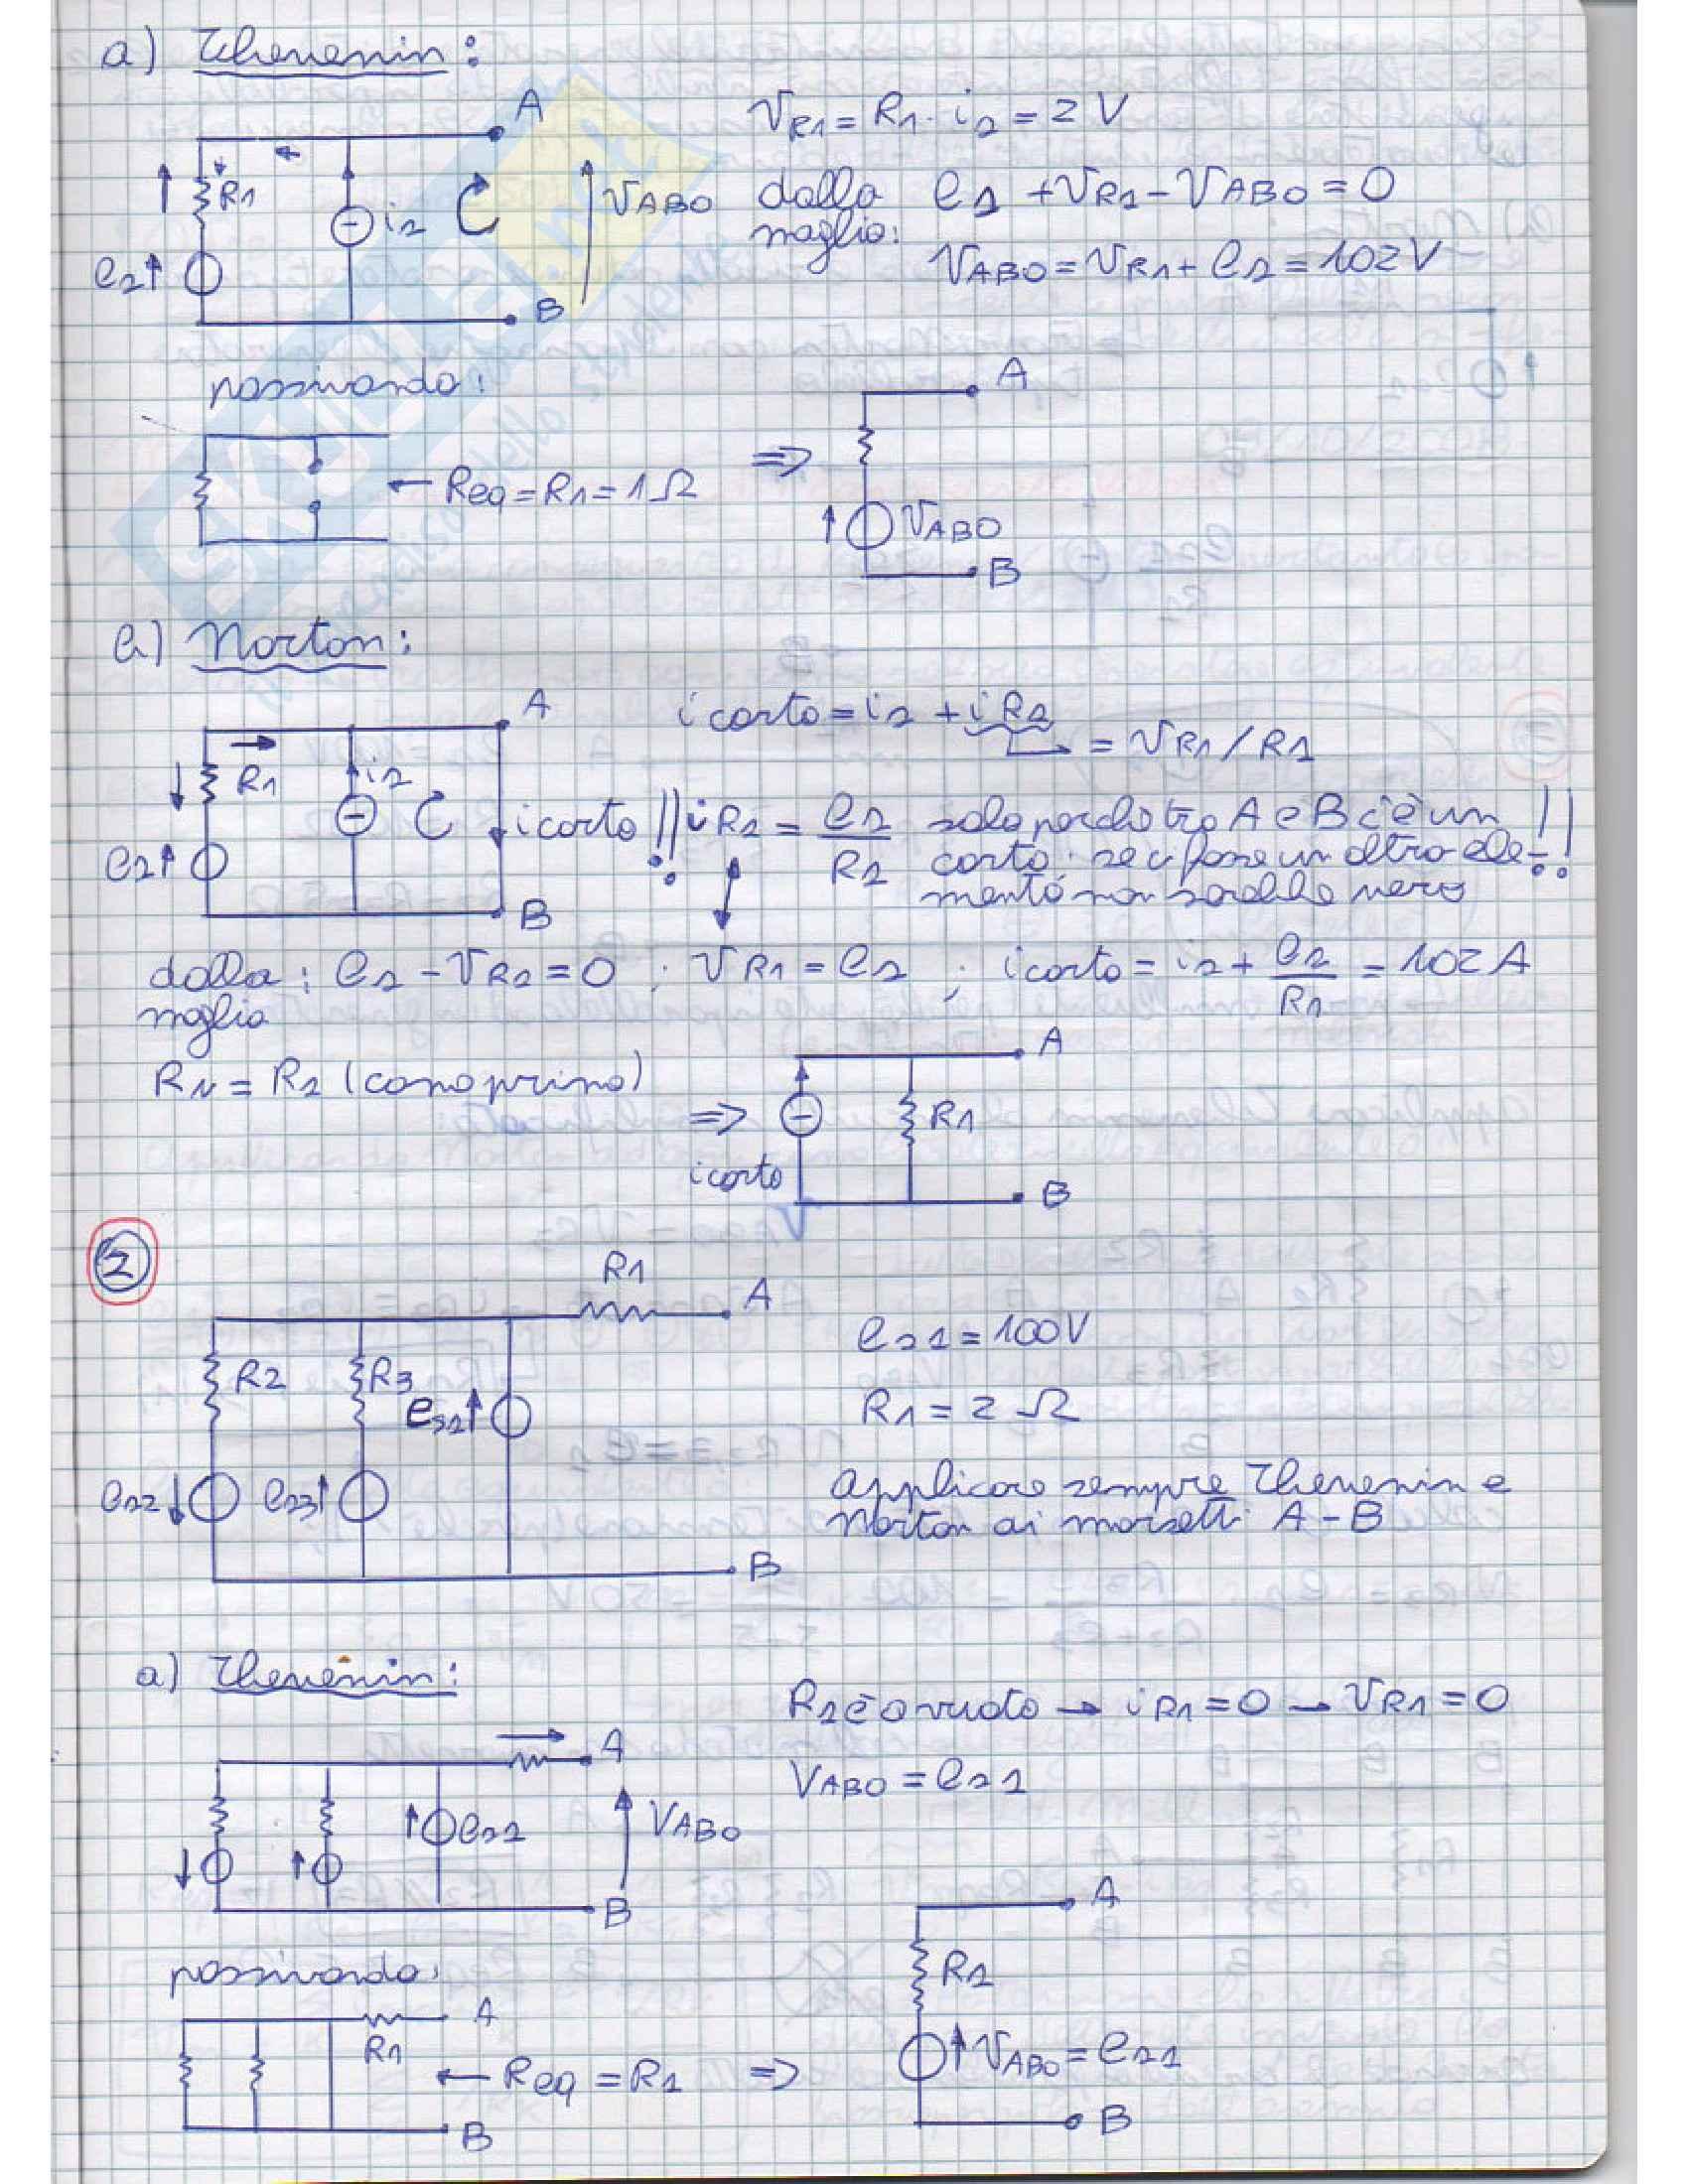 Principi di ingegneria elettrica - Appunti Pag. 21